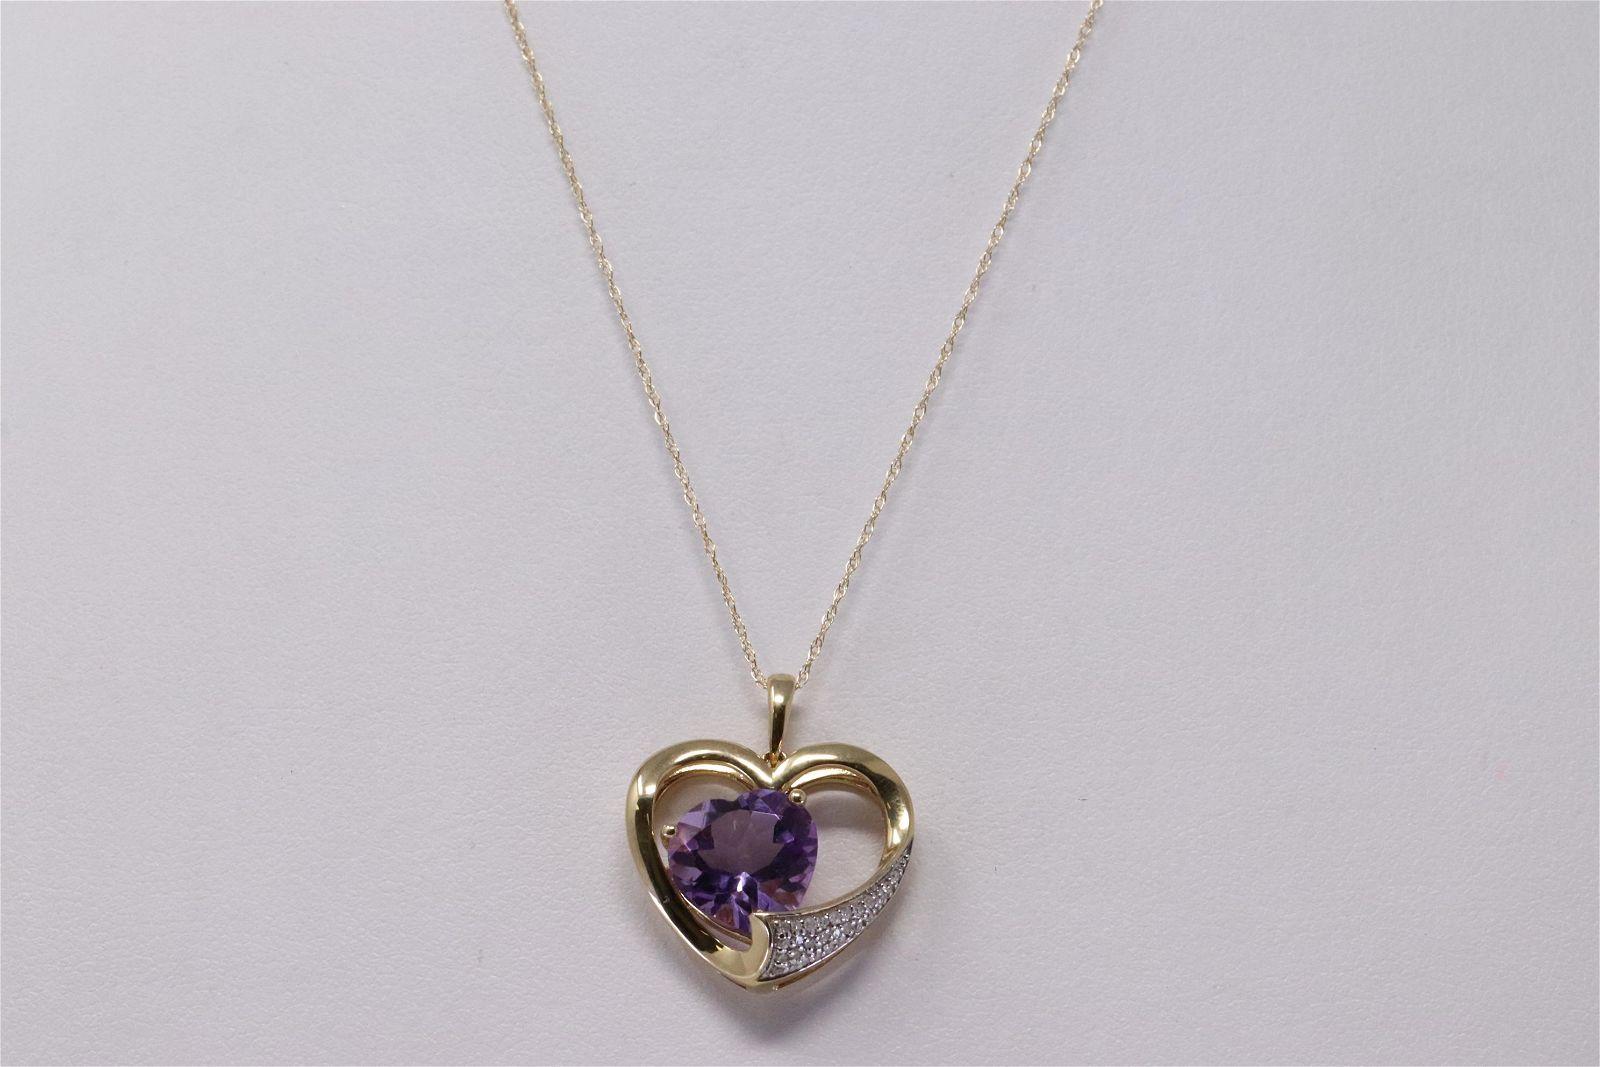 14K Yellow Gold Heart Amethyst Diamond Pendant.